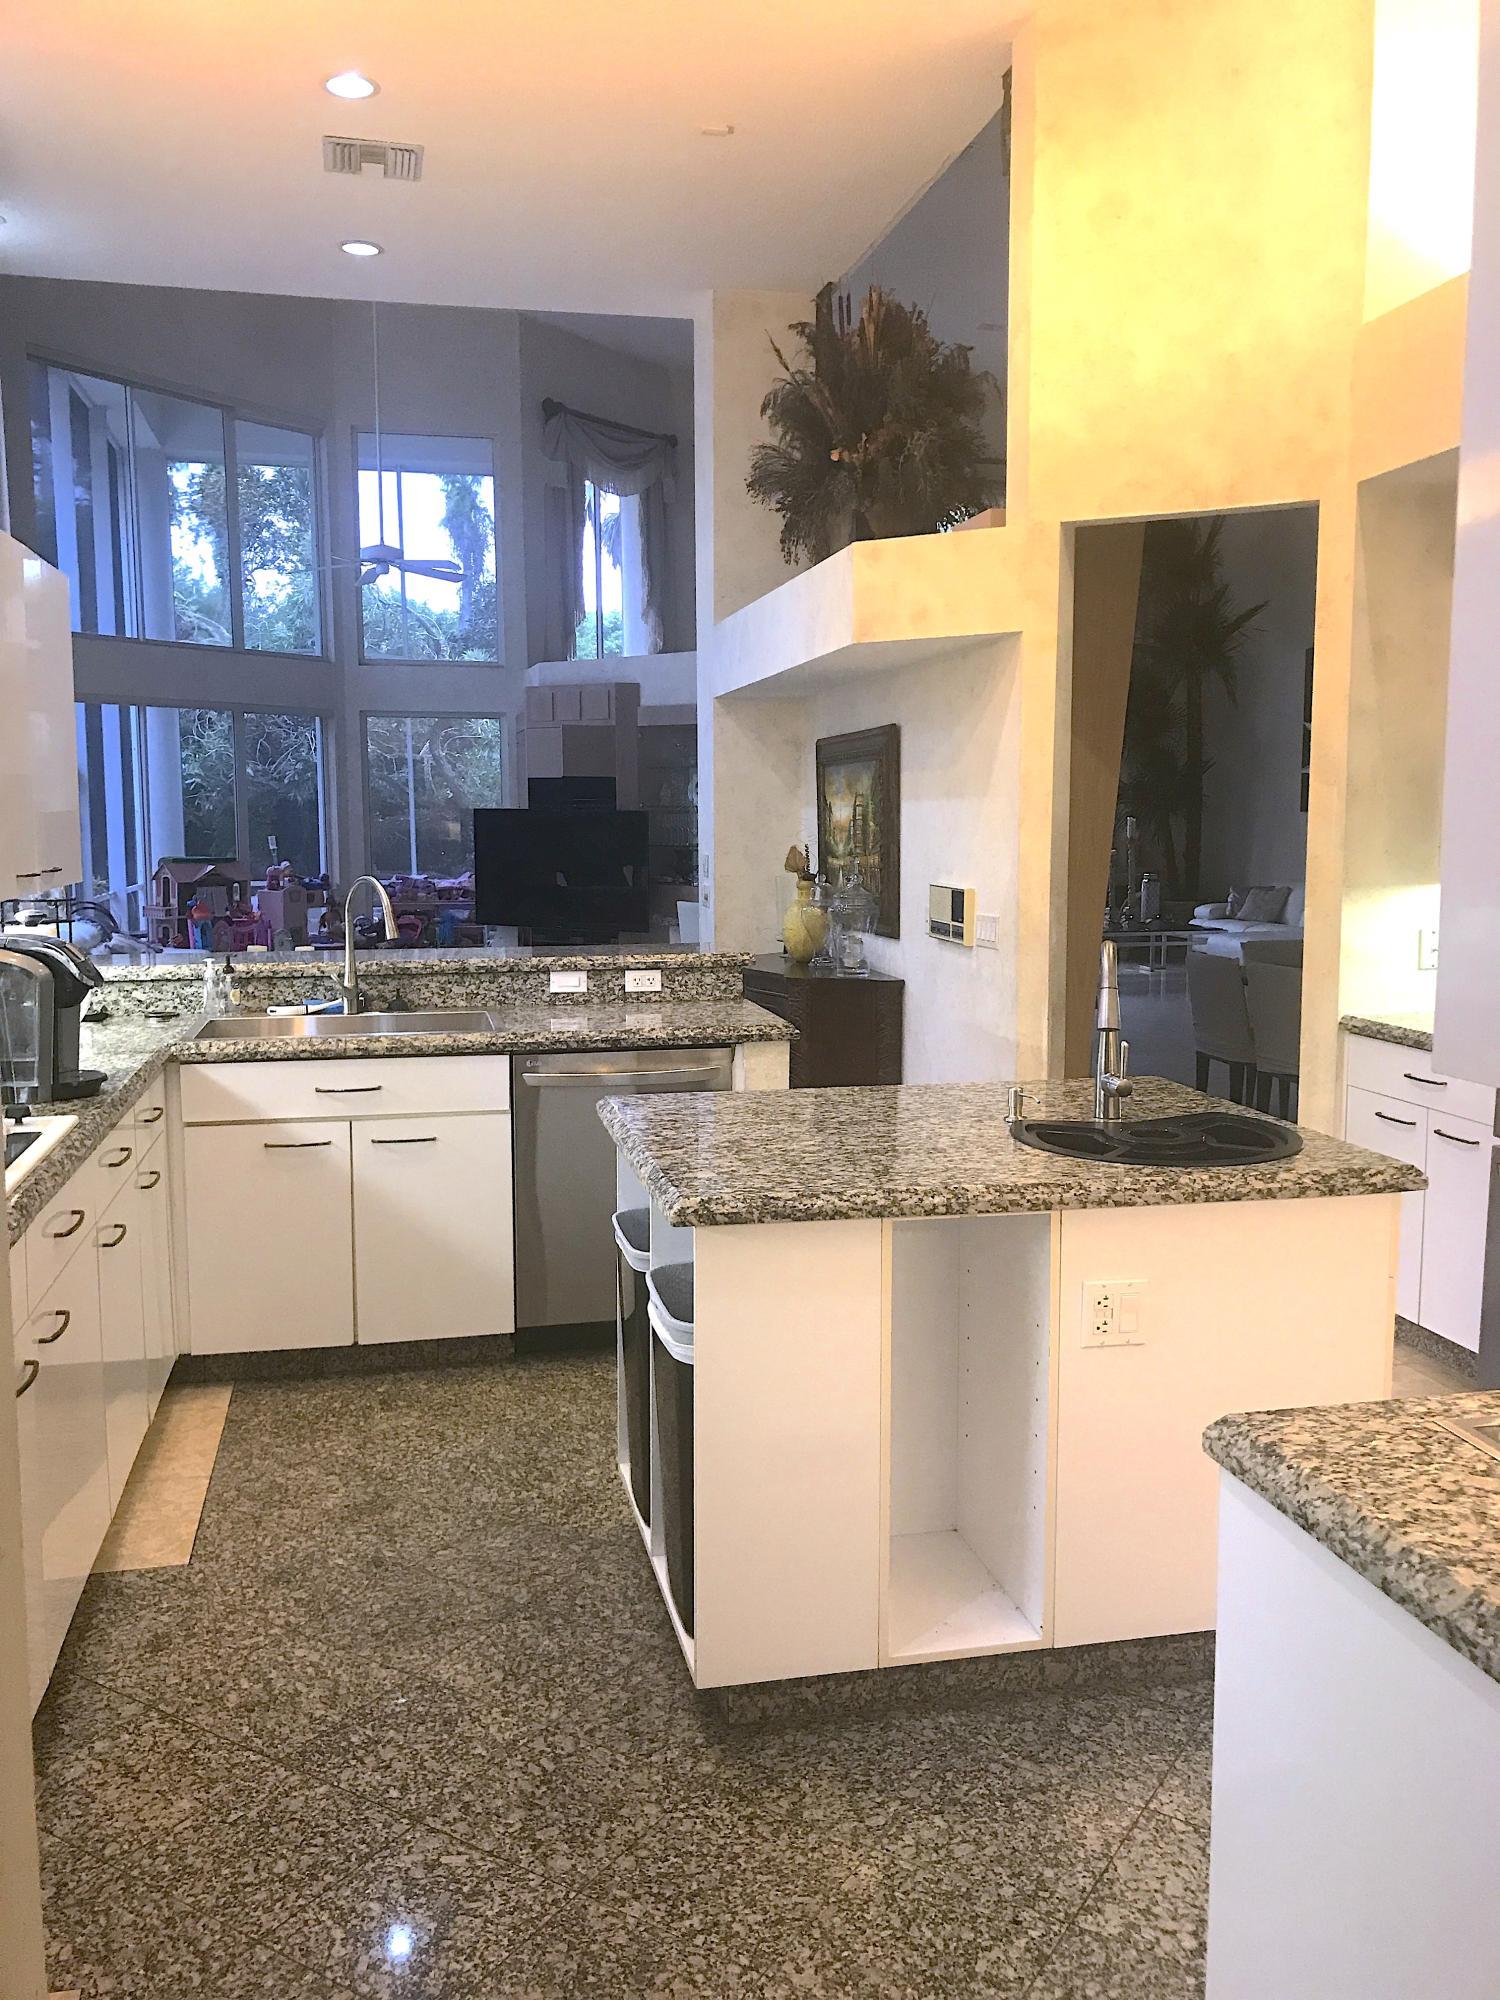 2643 64th Boulevard, Boca Raton, Florida 33496, 5 Bedrooms Bedrooms, ,4.1 BathroomsBathrooms,Single Family,For Sale,BROKEN SOUND,64th,RX-10385020